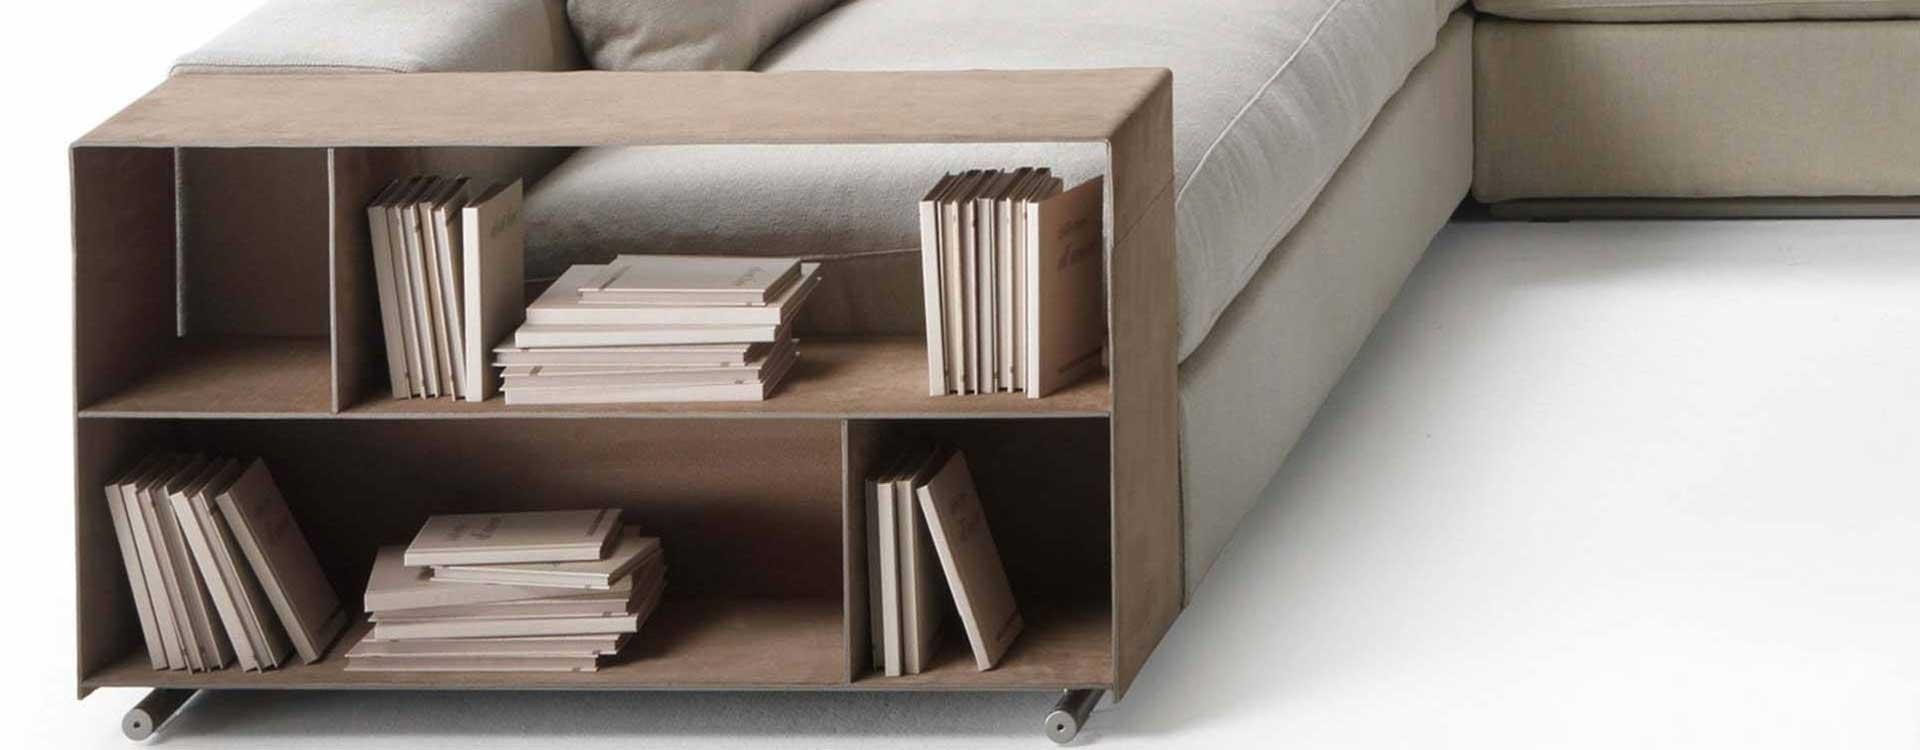 Armrest detail library from Flexform Grounpiece